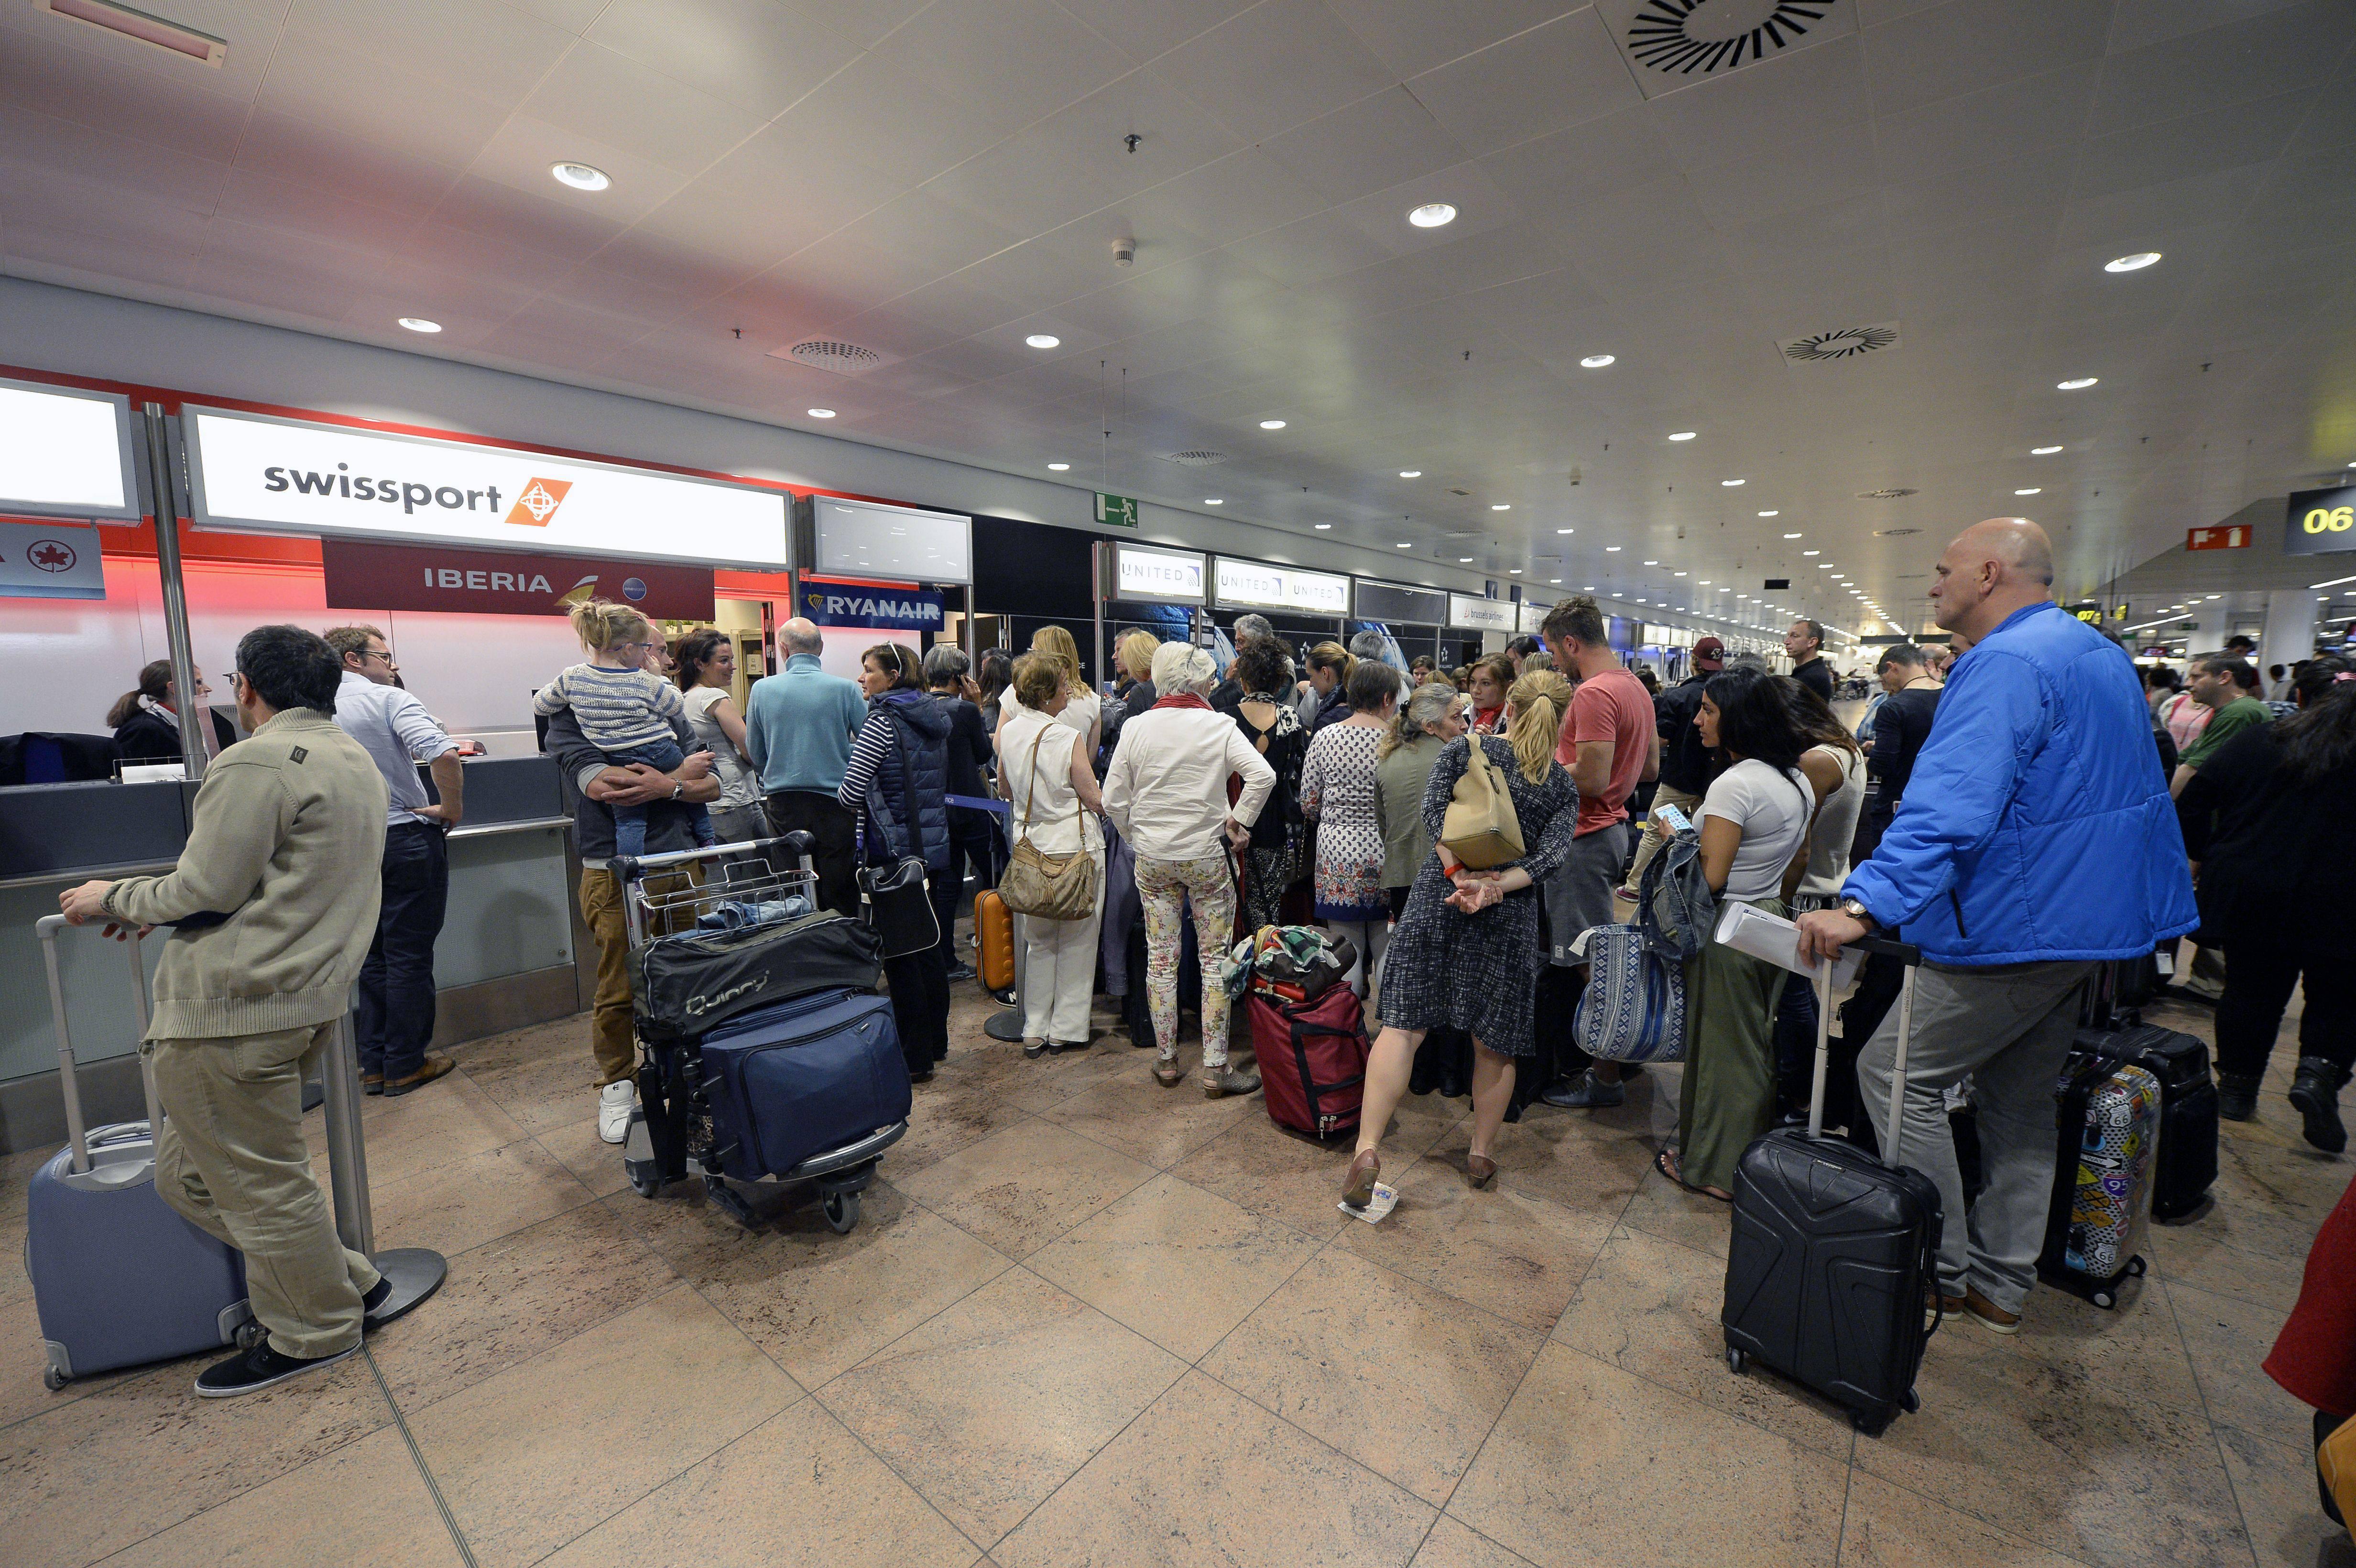 Aeroporto di Bruxelles-Zaventem (ERIC LALMAND/AFP/Getty Images)